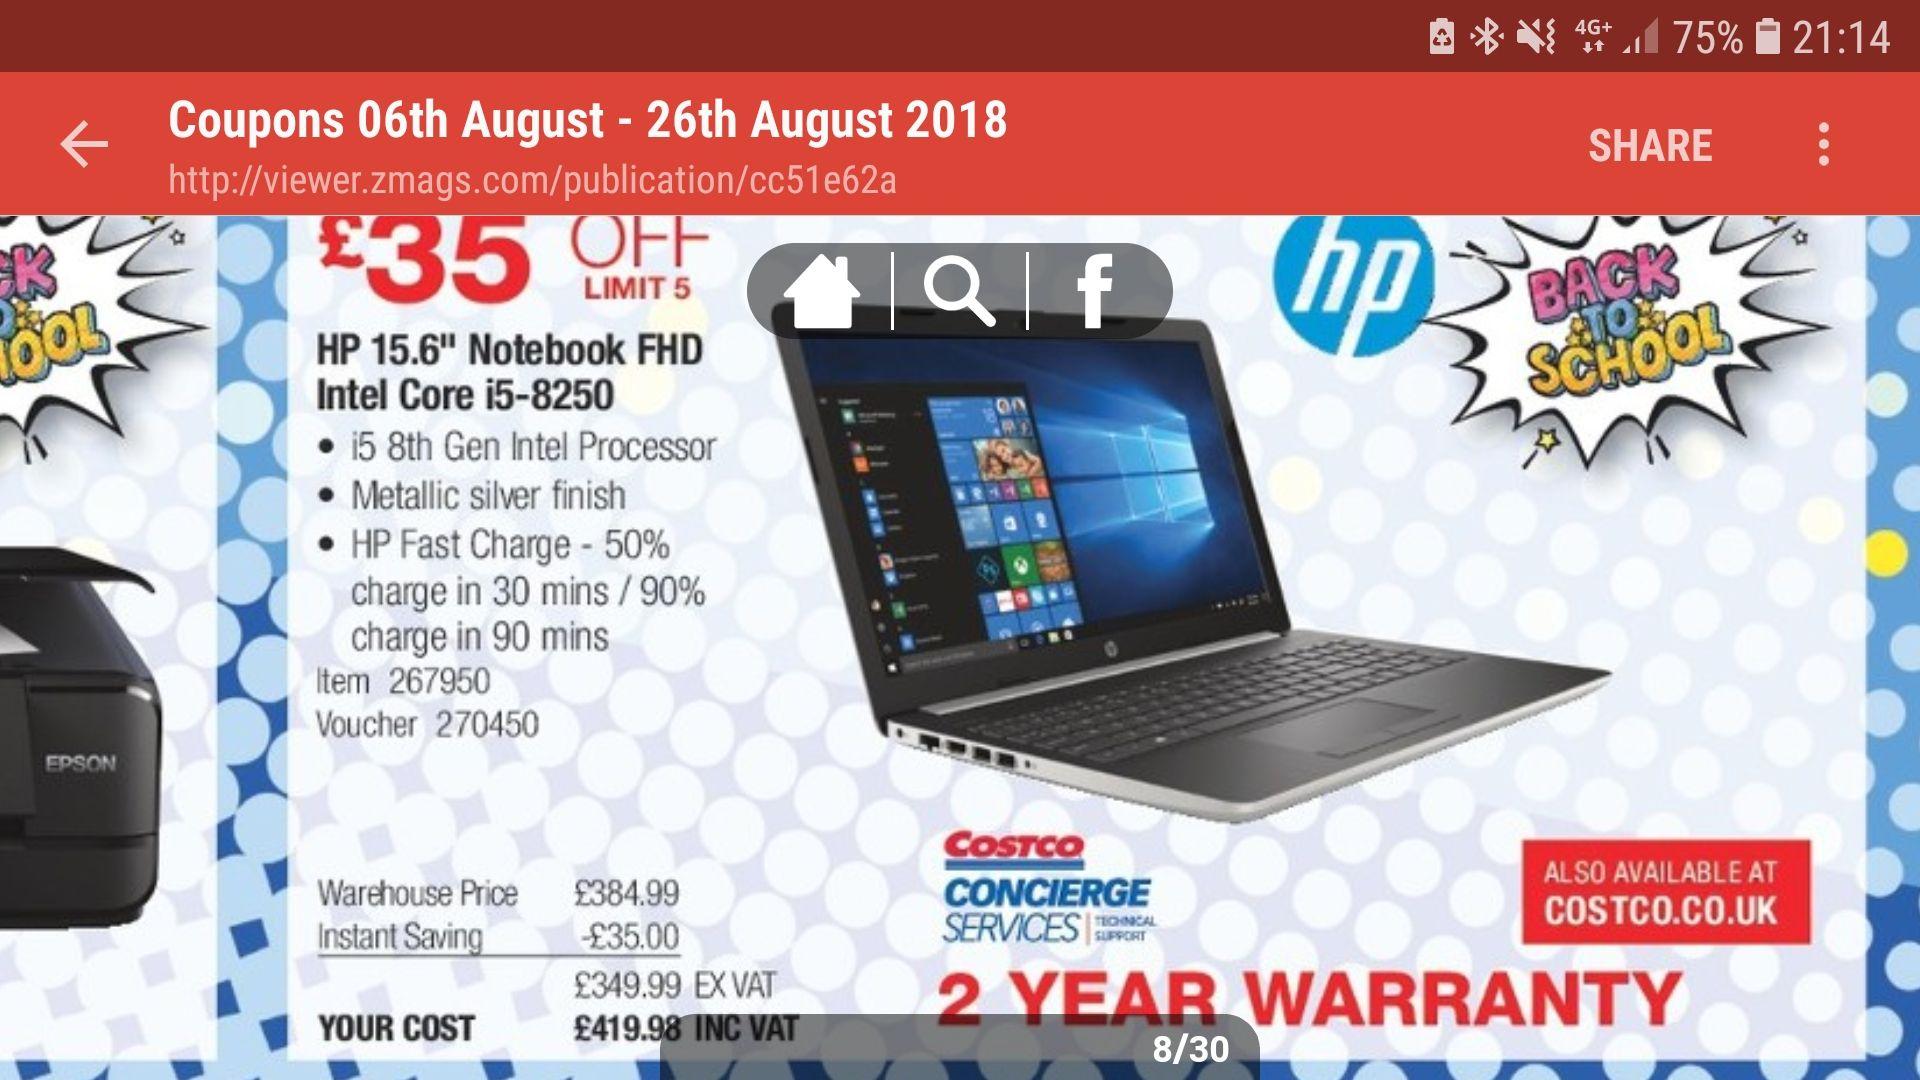 Hp laptop i5 8th gen FHD £419.98 @ Costco